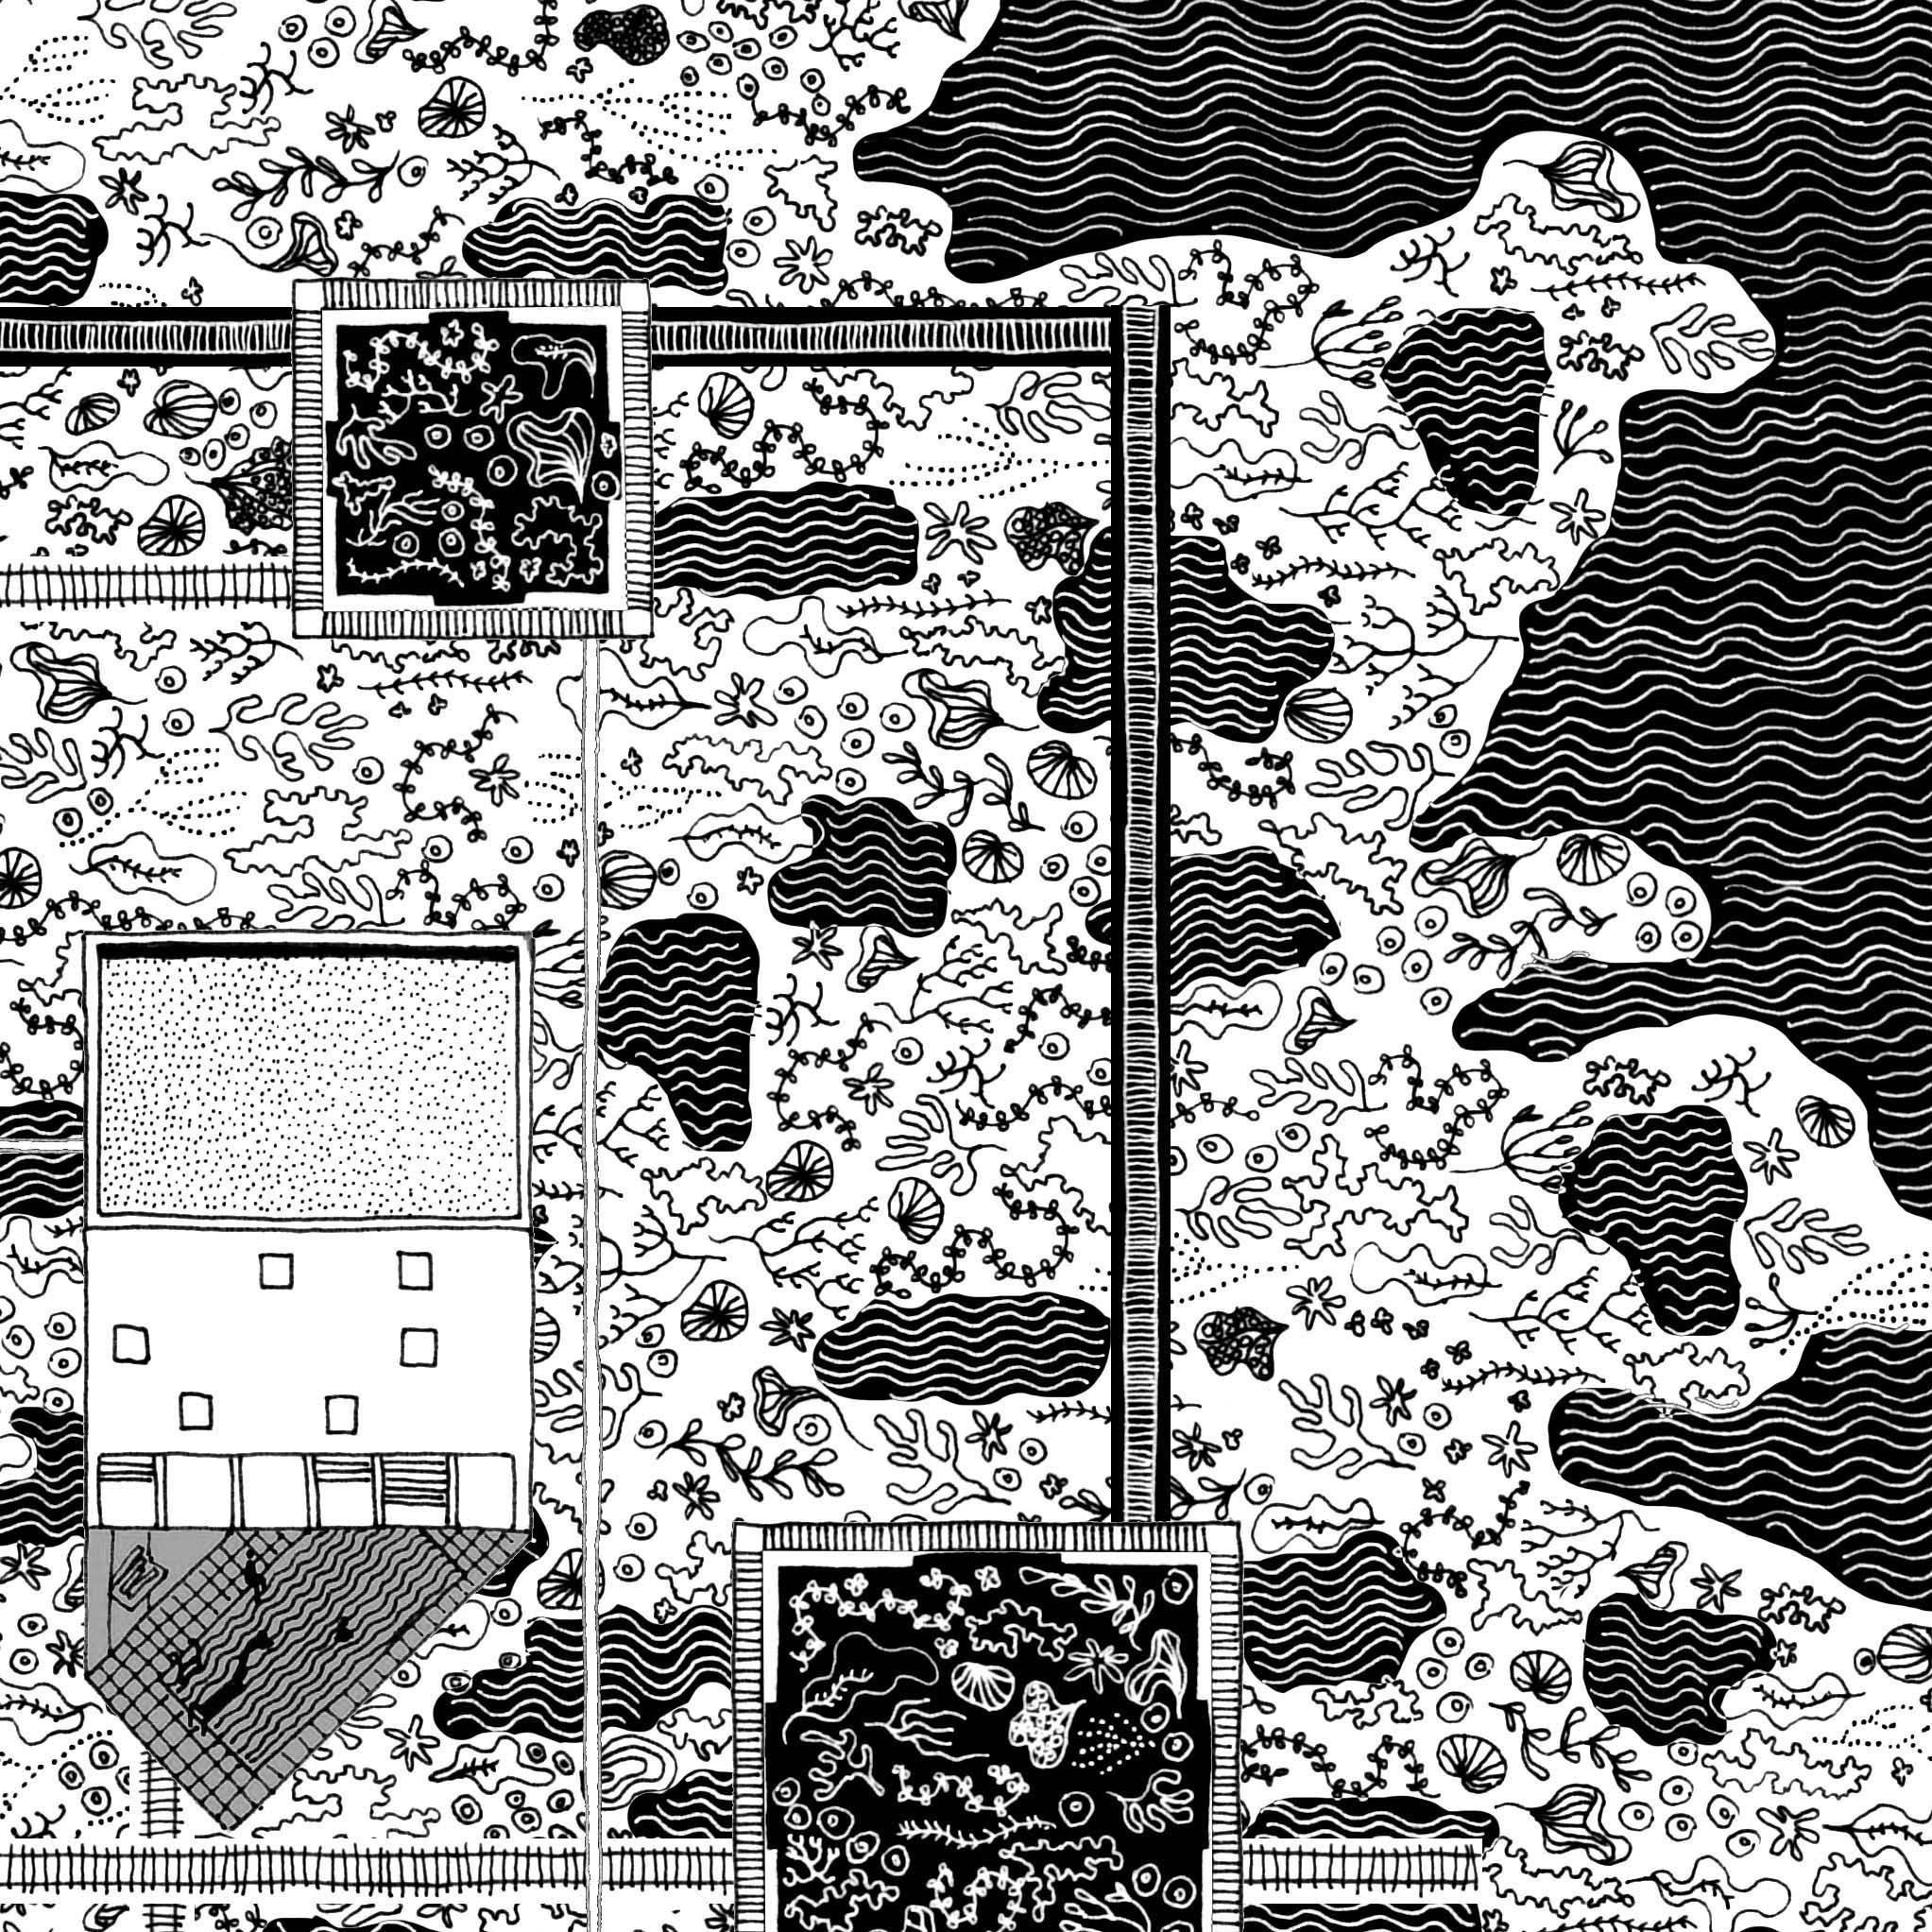 illustration_desplans_contest_crop